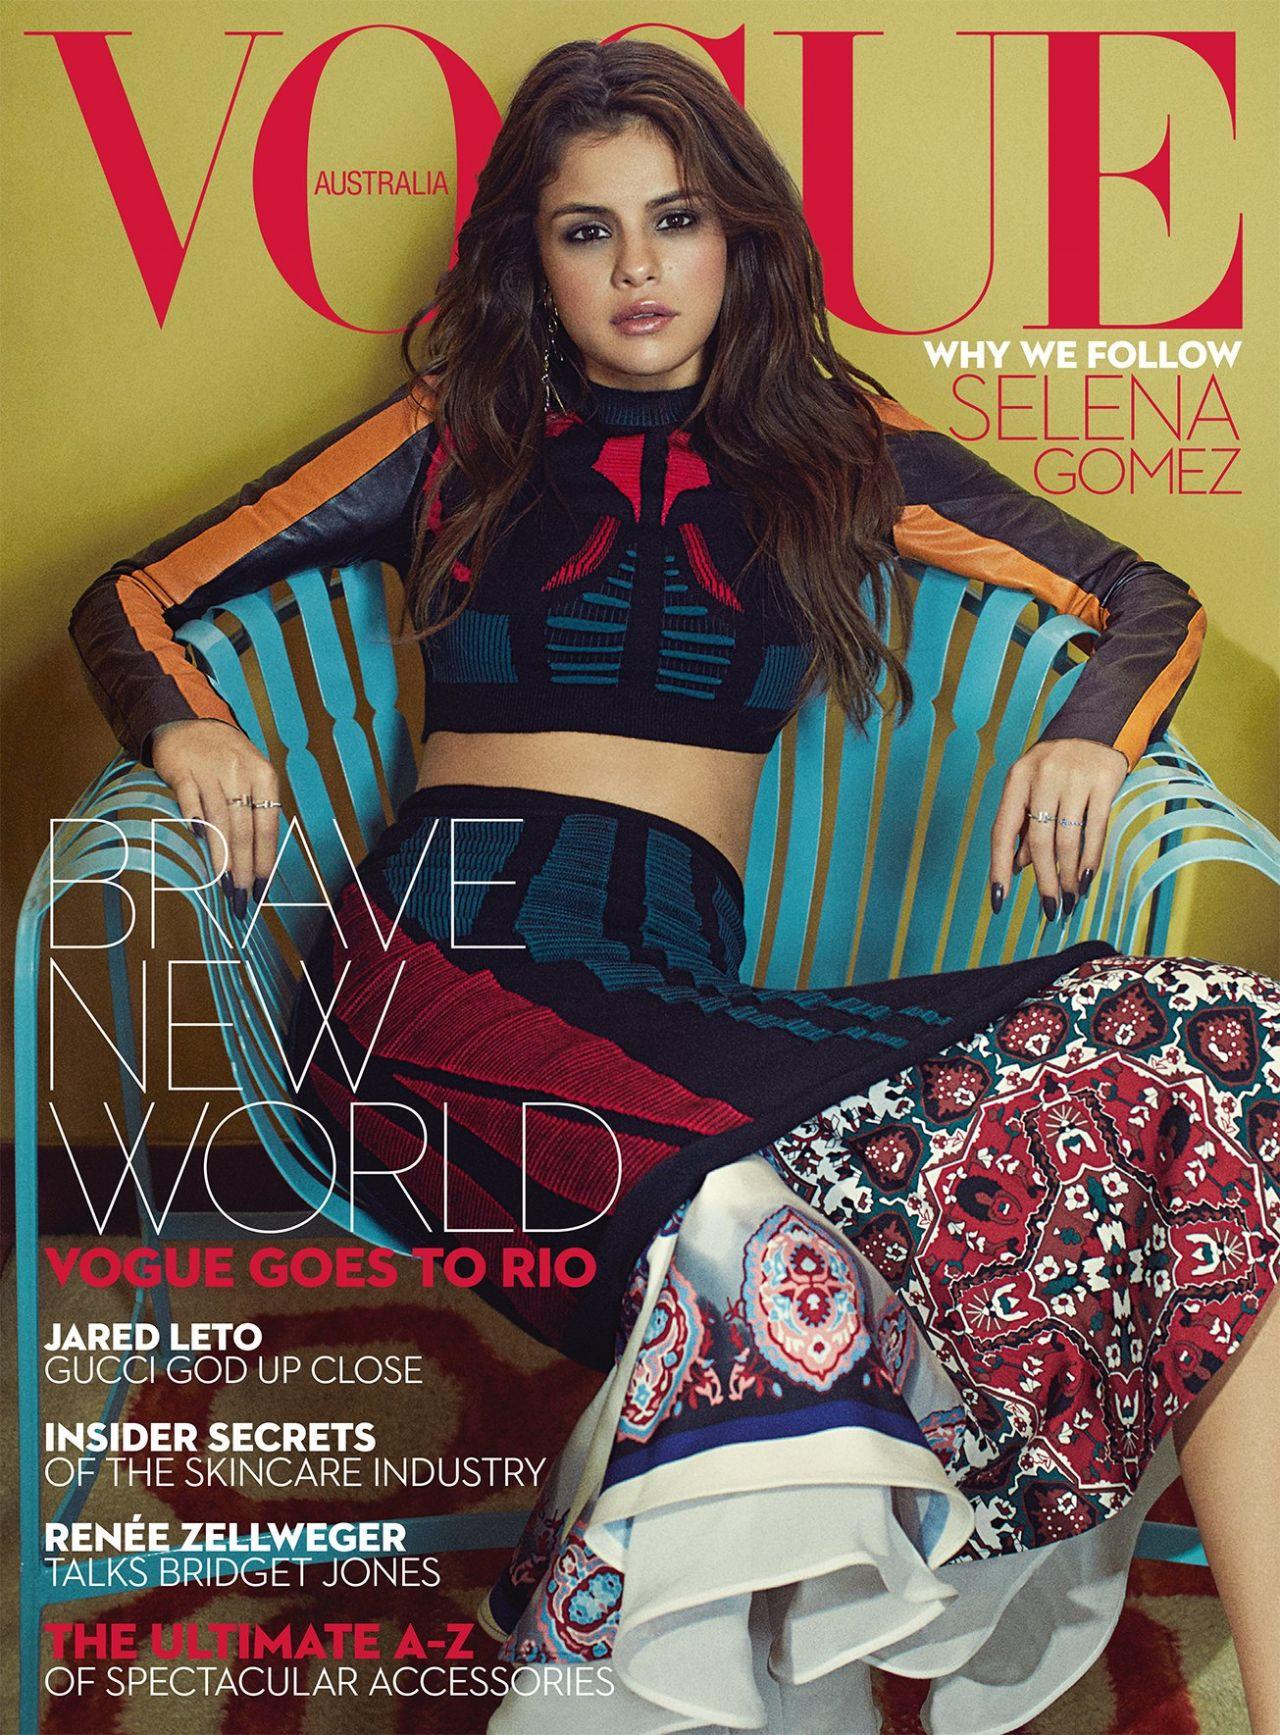 Vogue The Top Selling Fashion Magazine: Vogue Magazine Australia September 2016